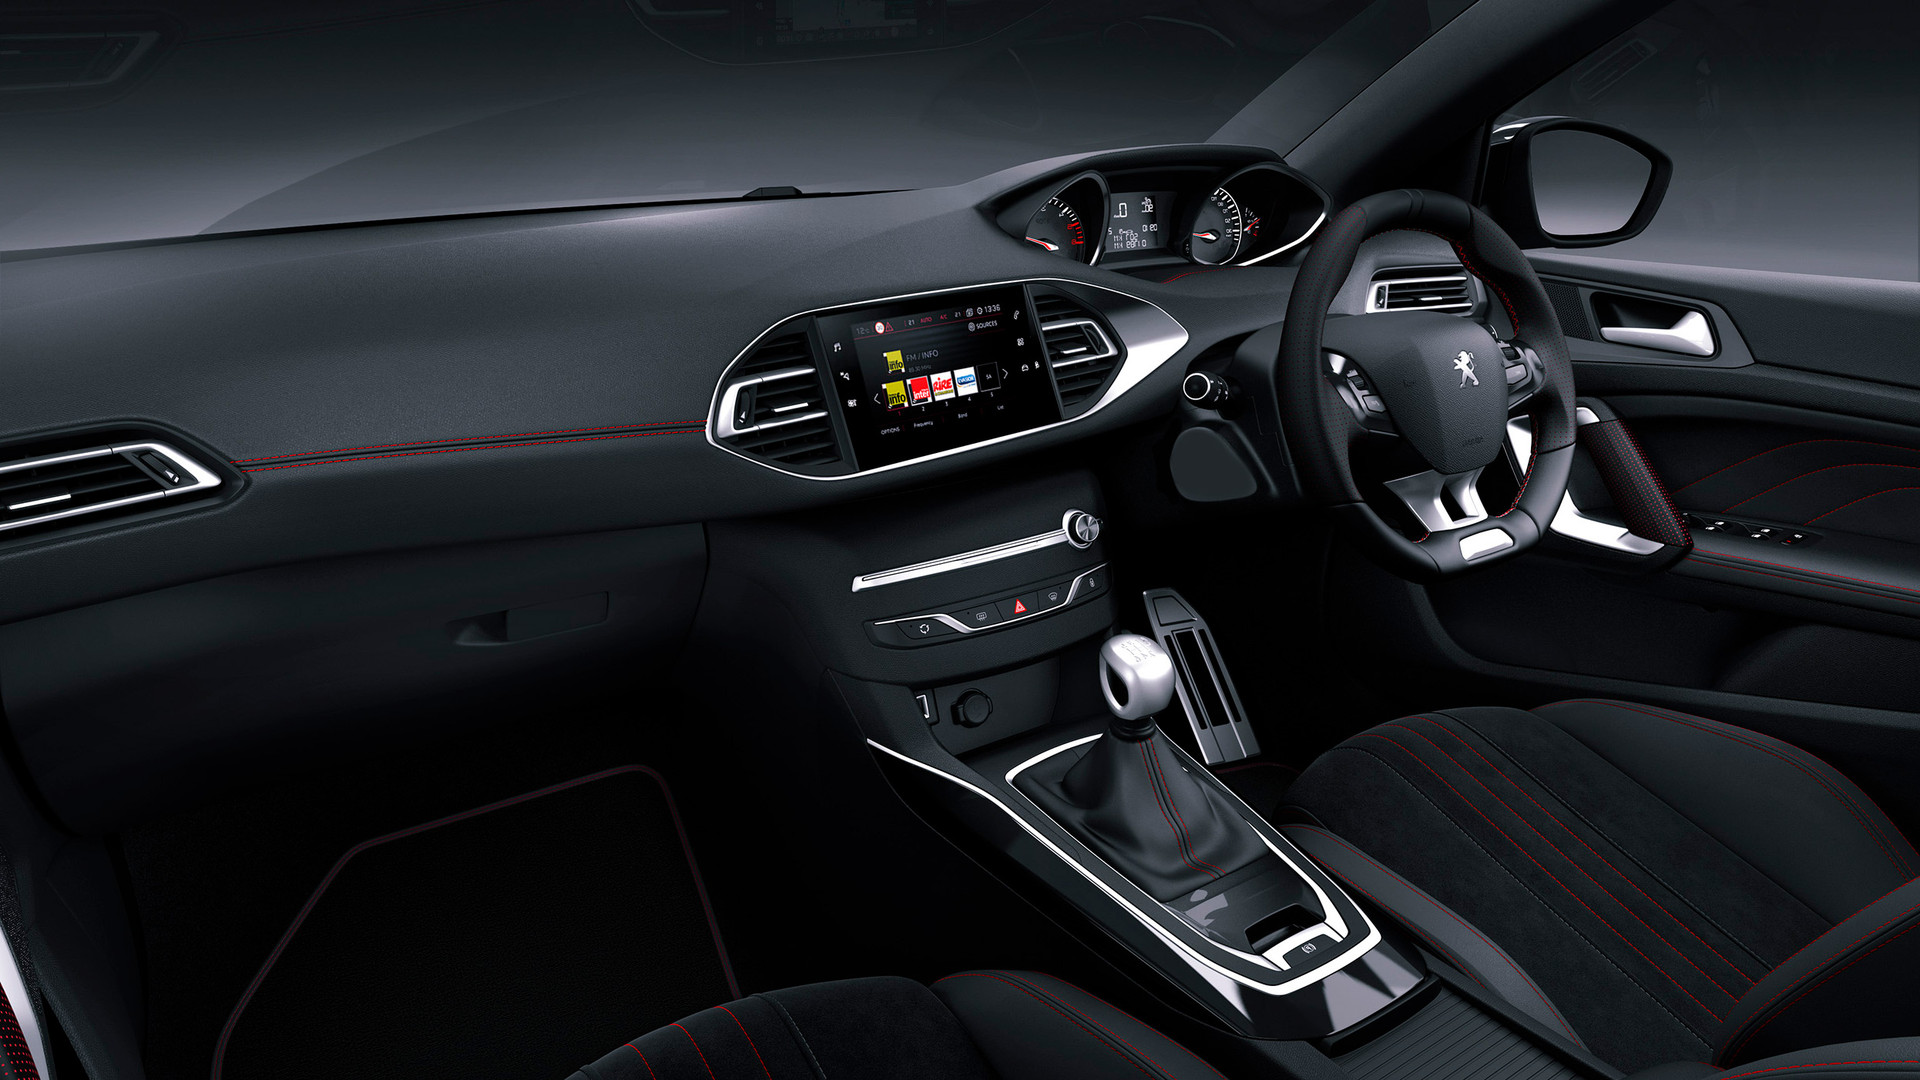 308-i-cockpit-interior-high-res-sport.270396.17